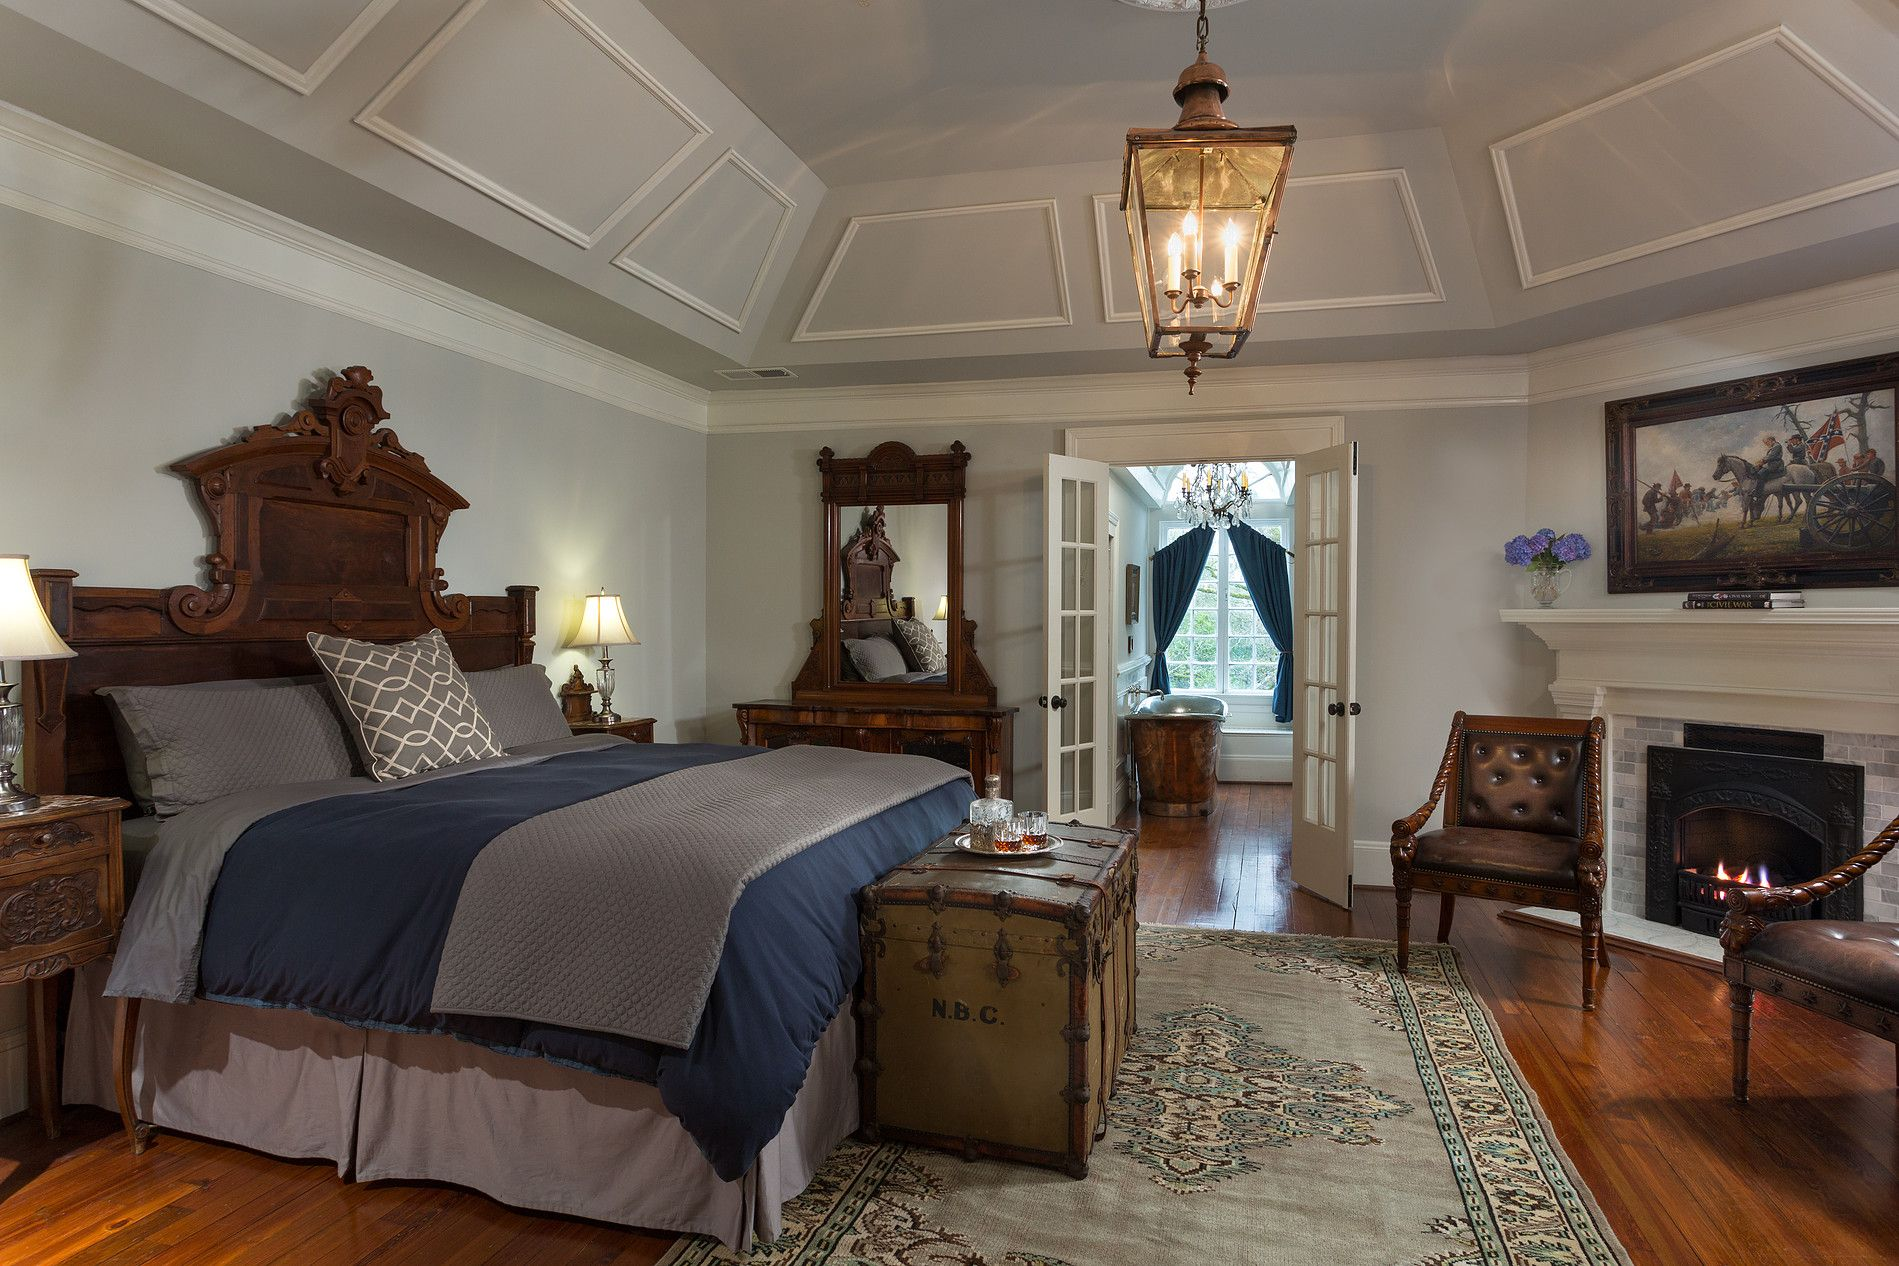 Twelve Oaks Bed and Breakfast Inn, Covington